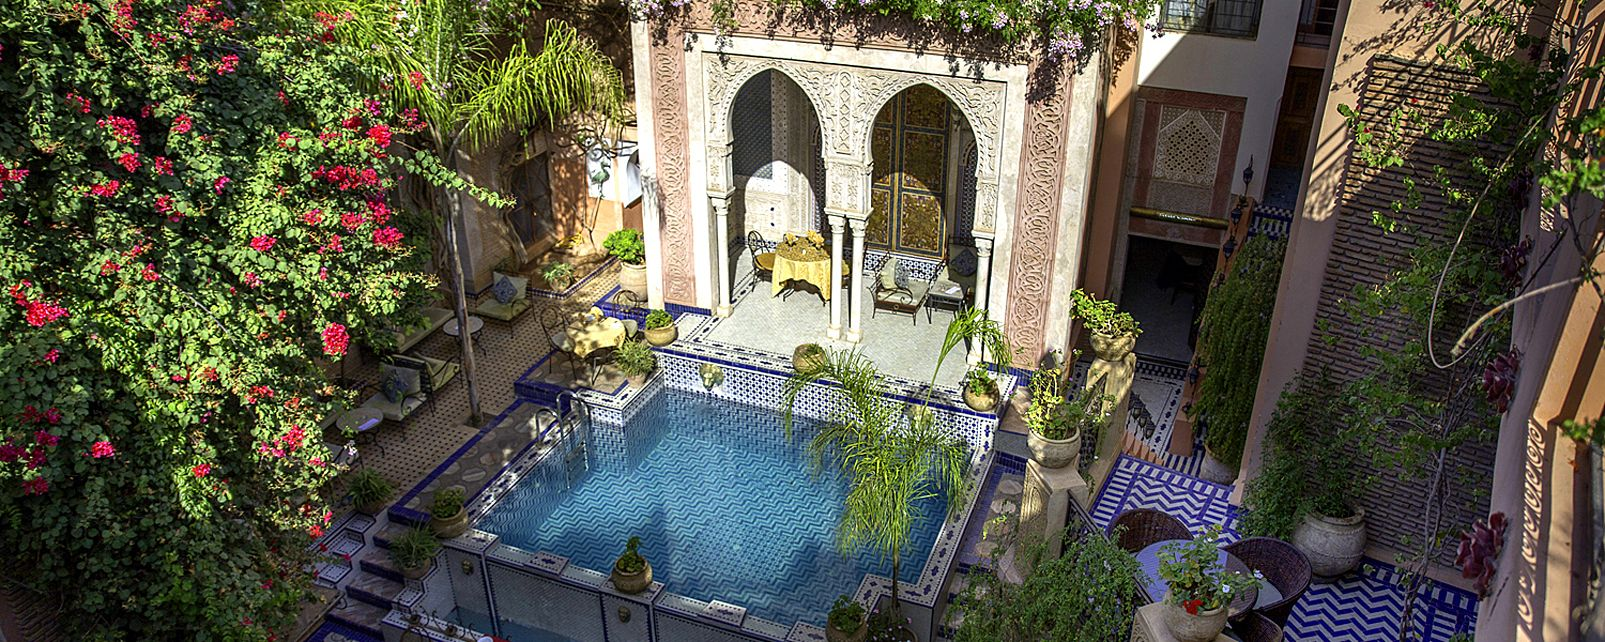 Hotel Palais Sebban